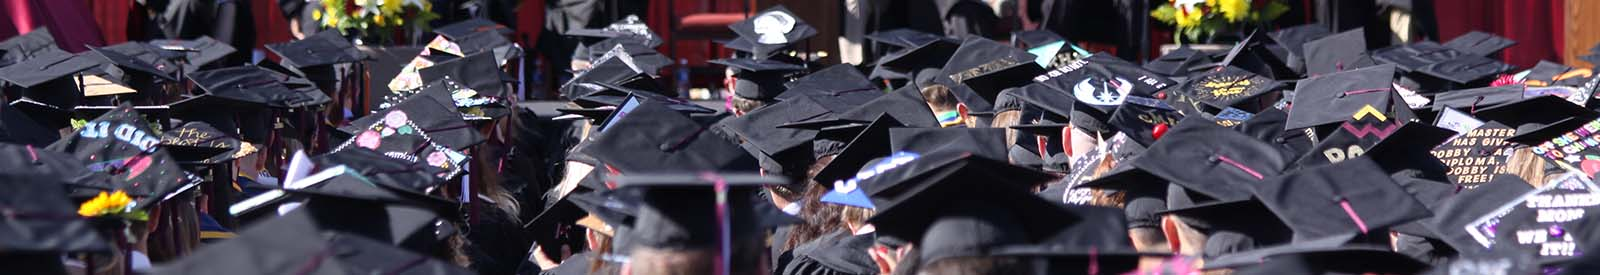 Cmu Graduation 2020.May 2020 Commencement Ceremony Colorado Mesa Univ